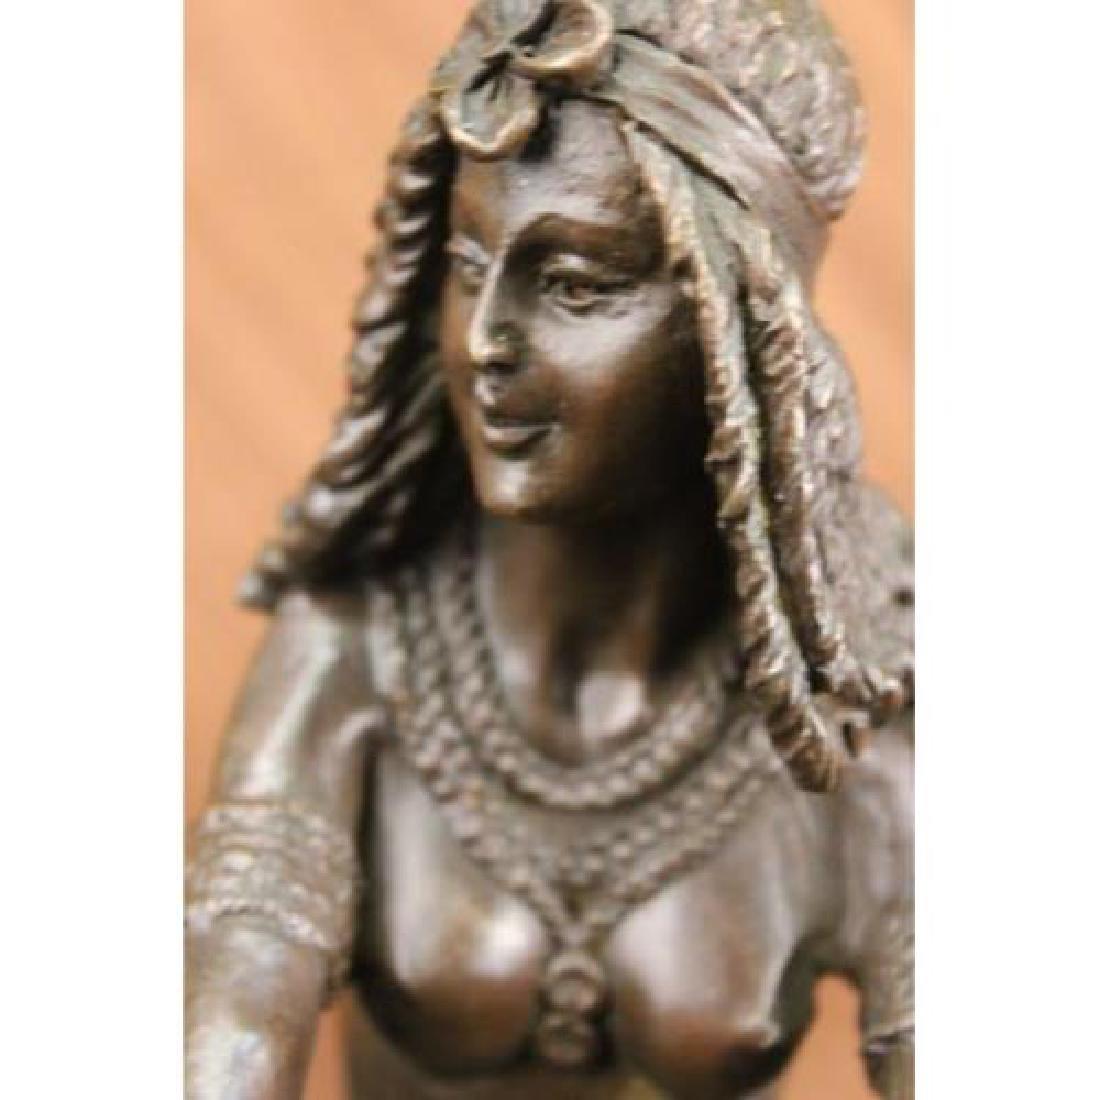 Sitting Egyptian Nude Princess Bronze Sculpture - 3